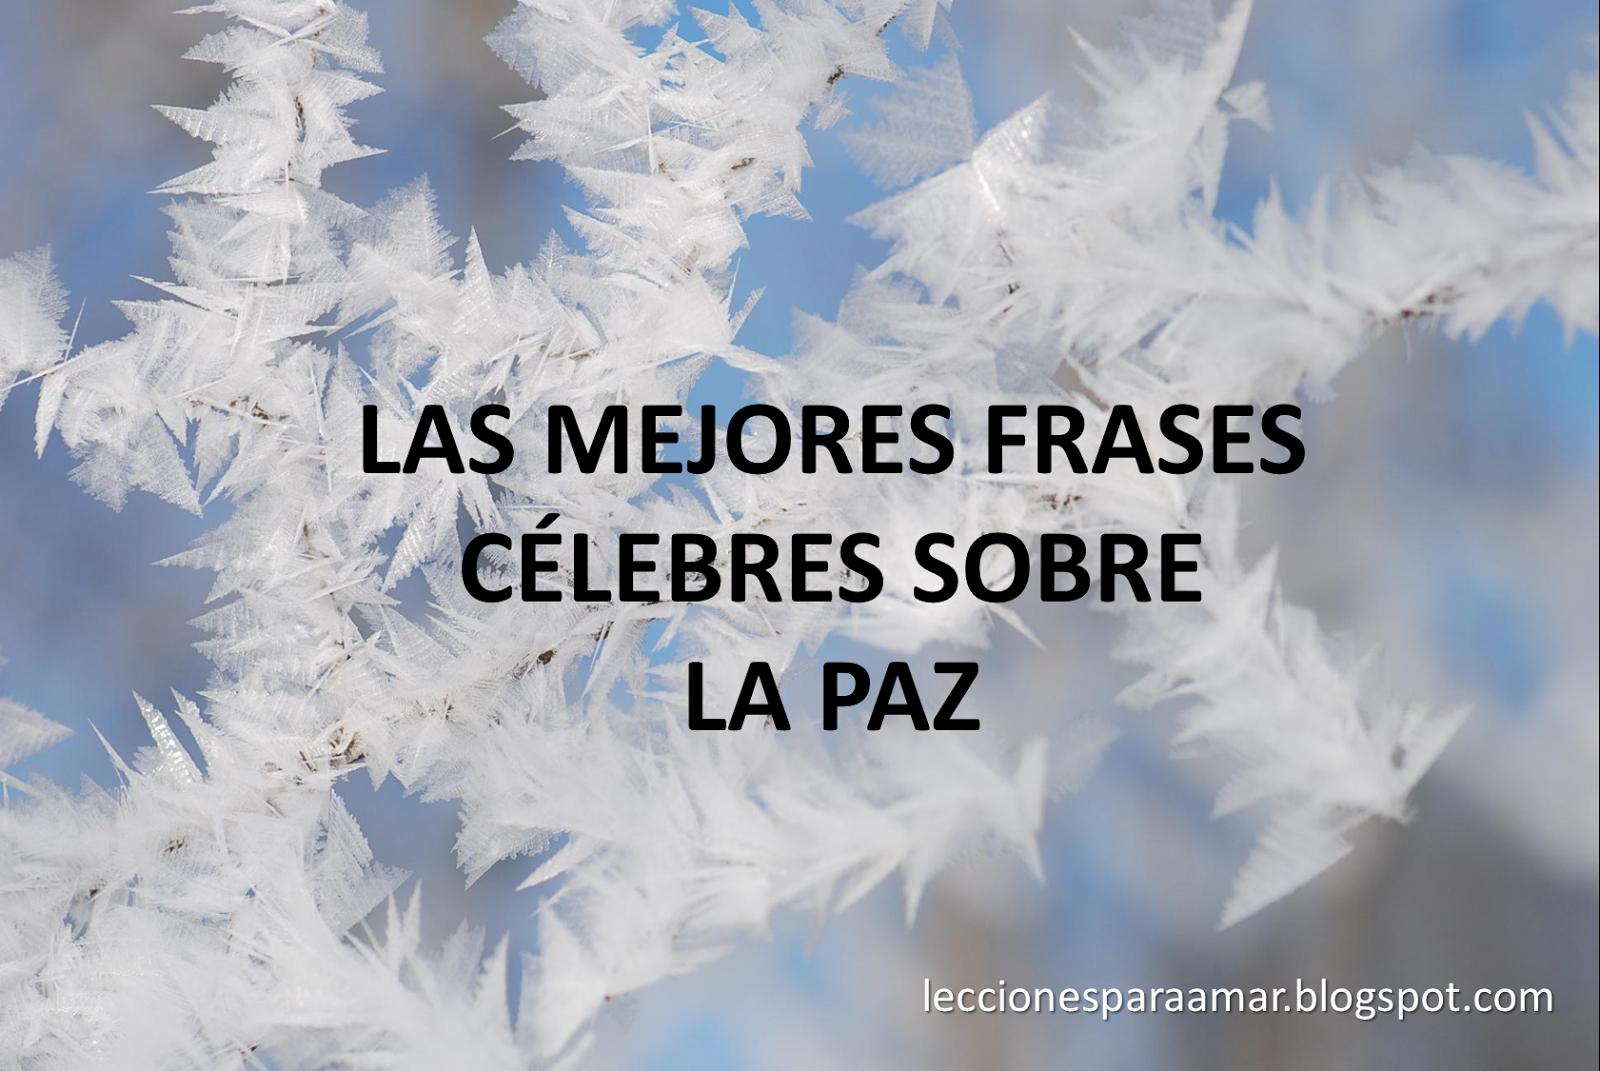 Mensagem De Paz: Lecciones Para Amar: Frases Célebres Sobre La Paz